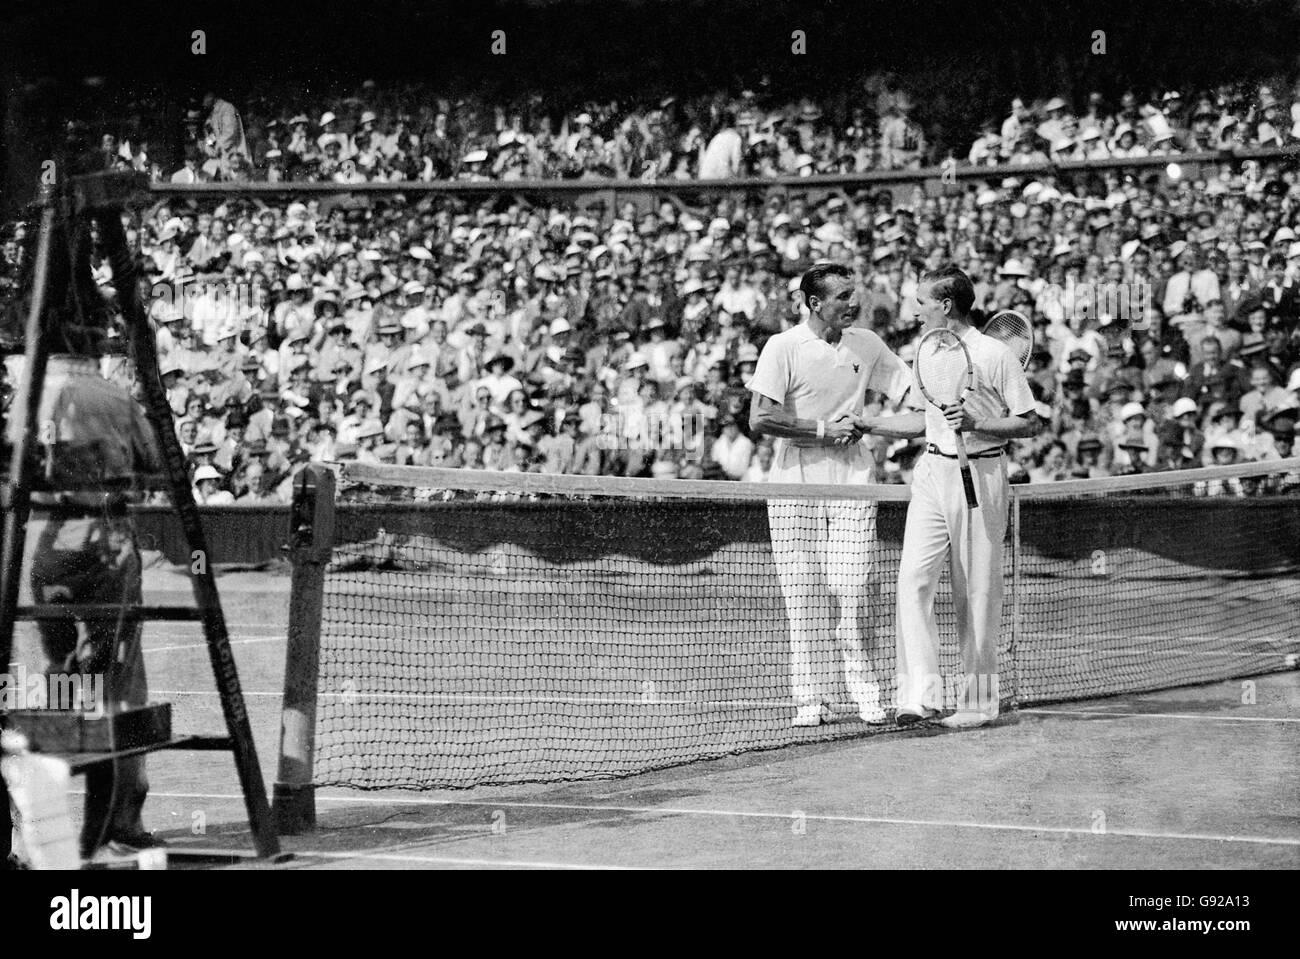 Tennis - Wimbledon Championships - Men's Singles - Final - Fred Perry v Gottfried Von Cramm - Stock Image